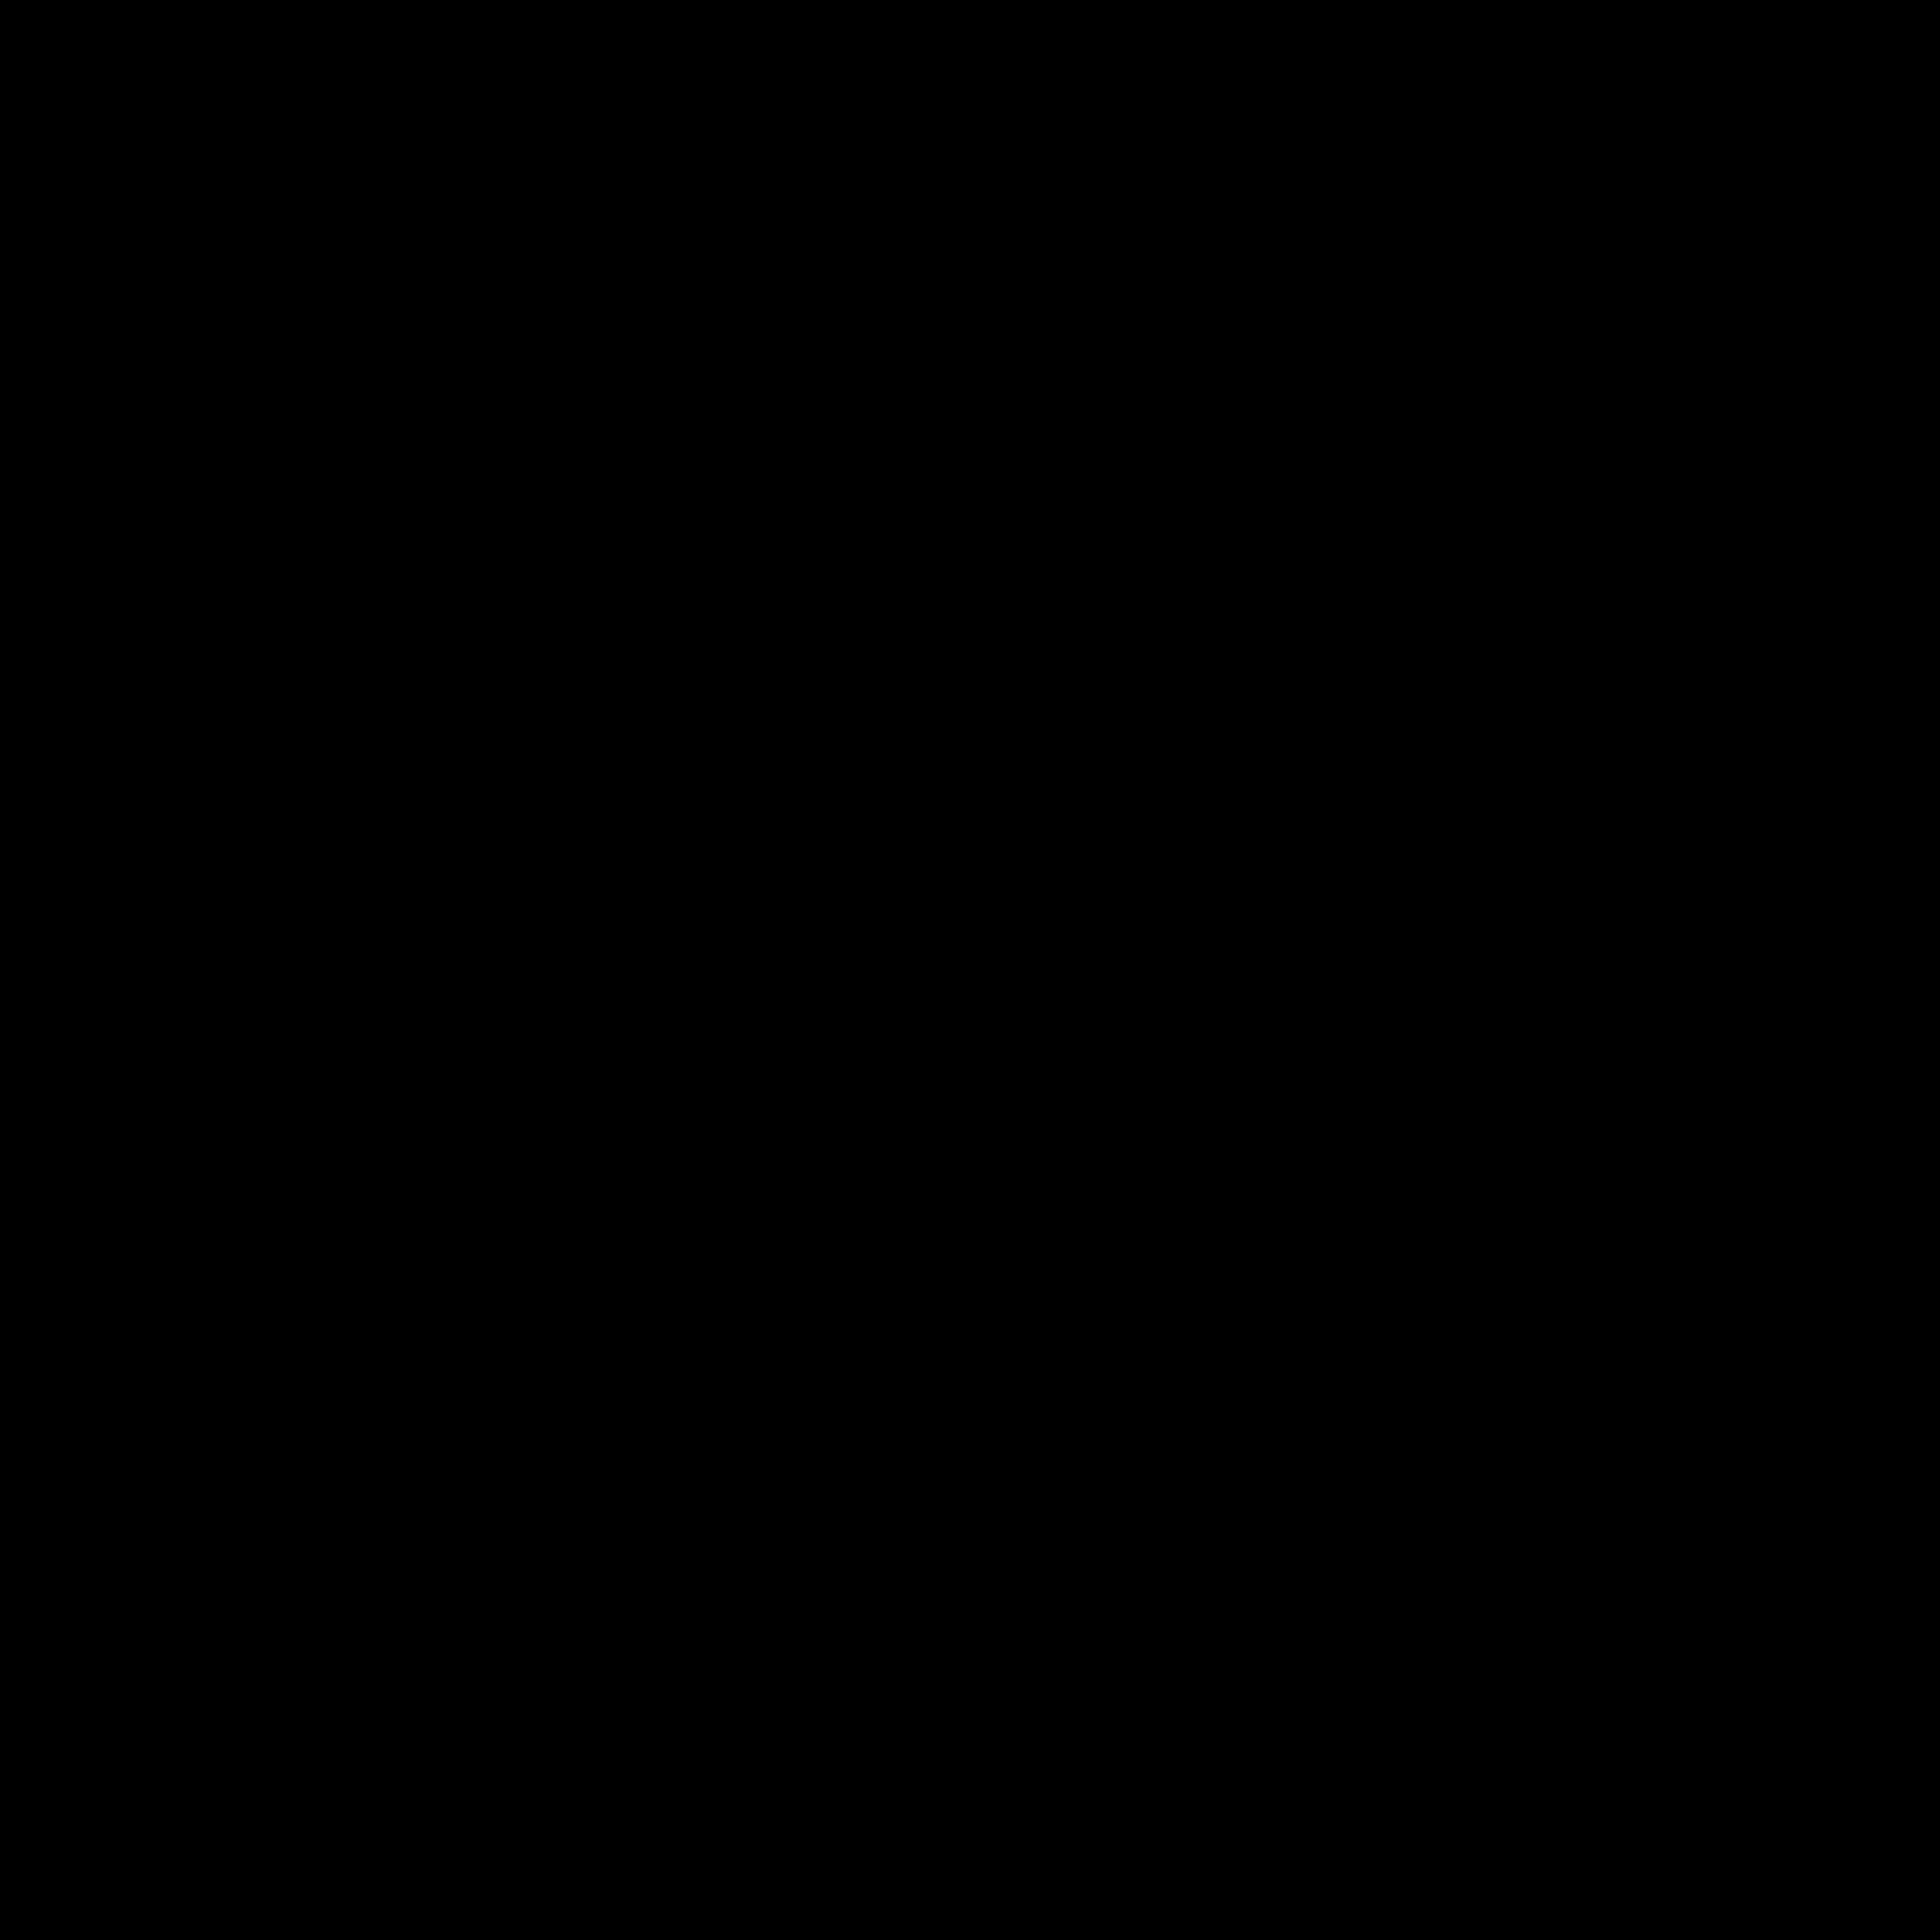 joop logo 0 - Joop! Logo